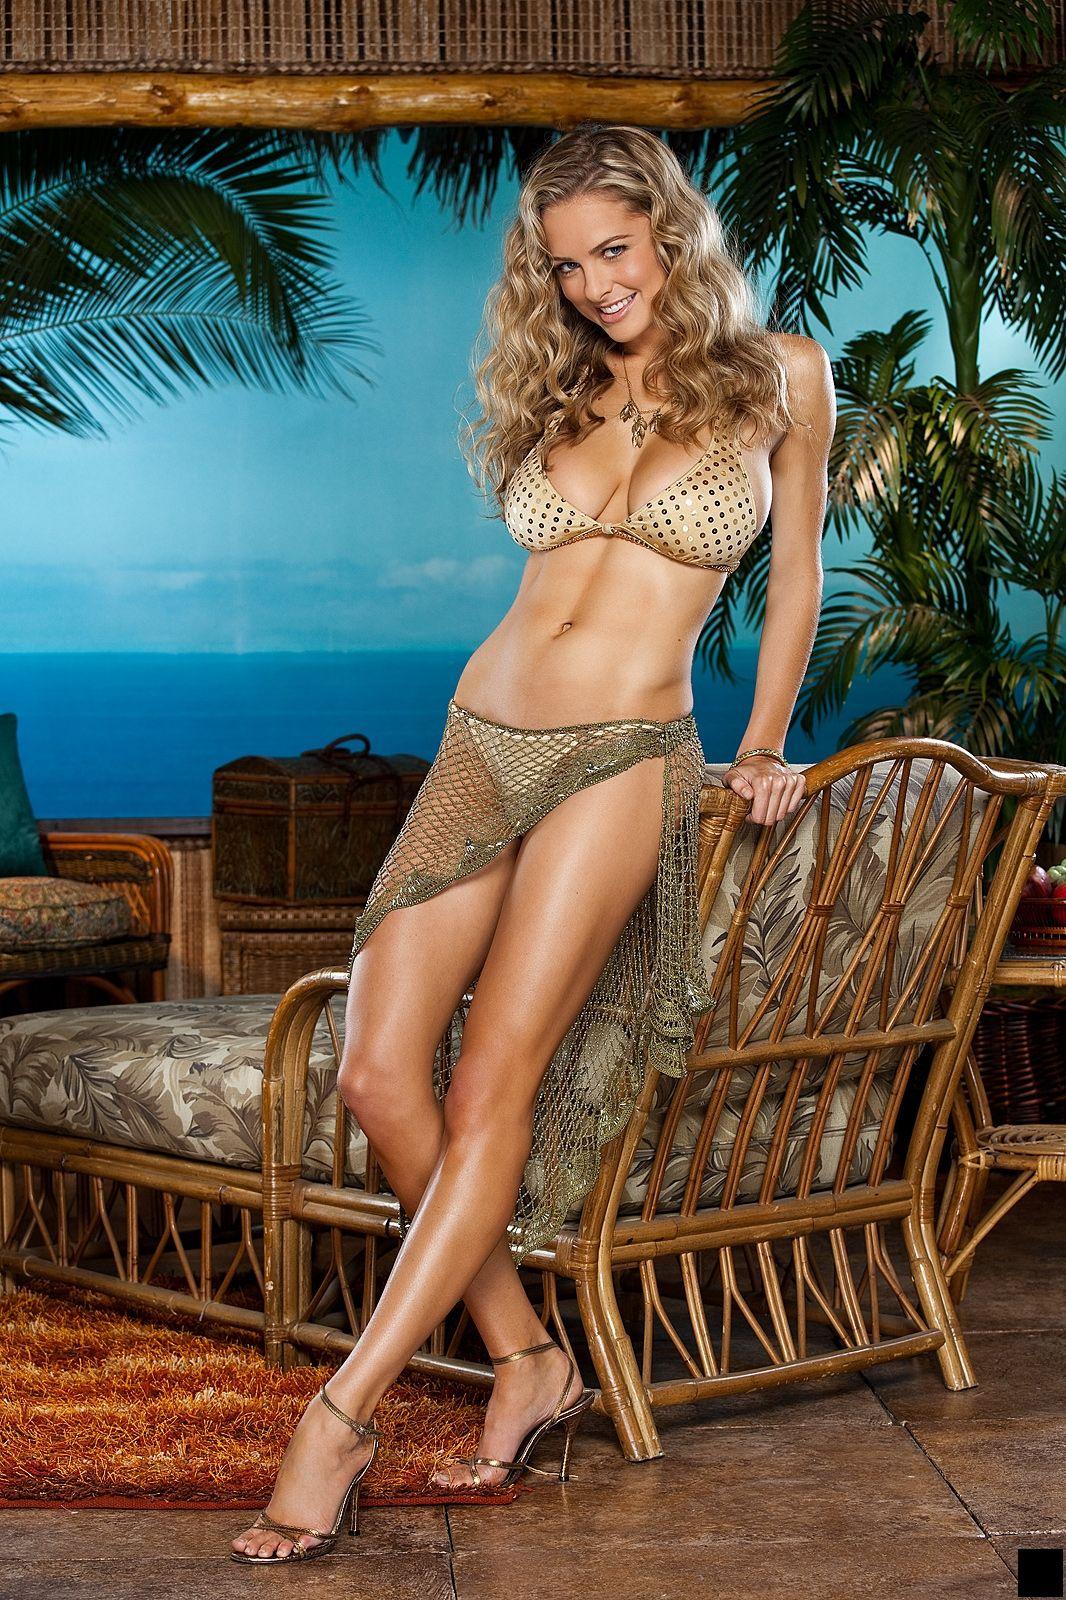 American model Shanna Marie McLaughlin